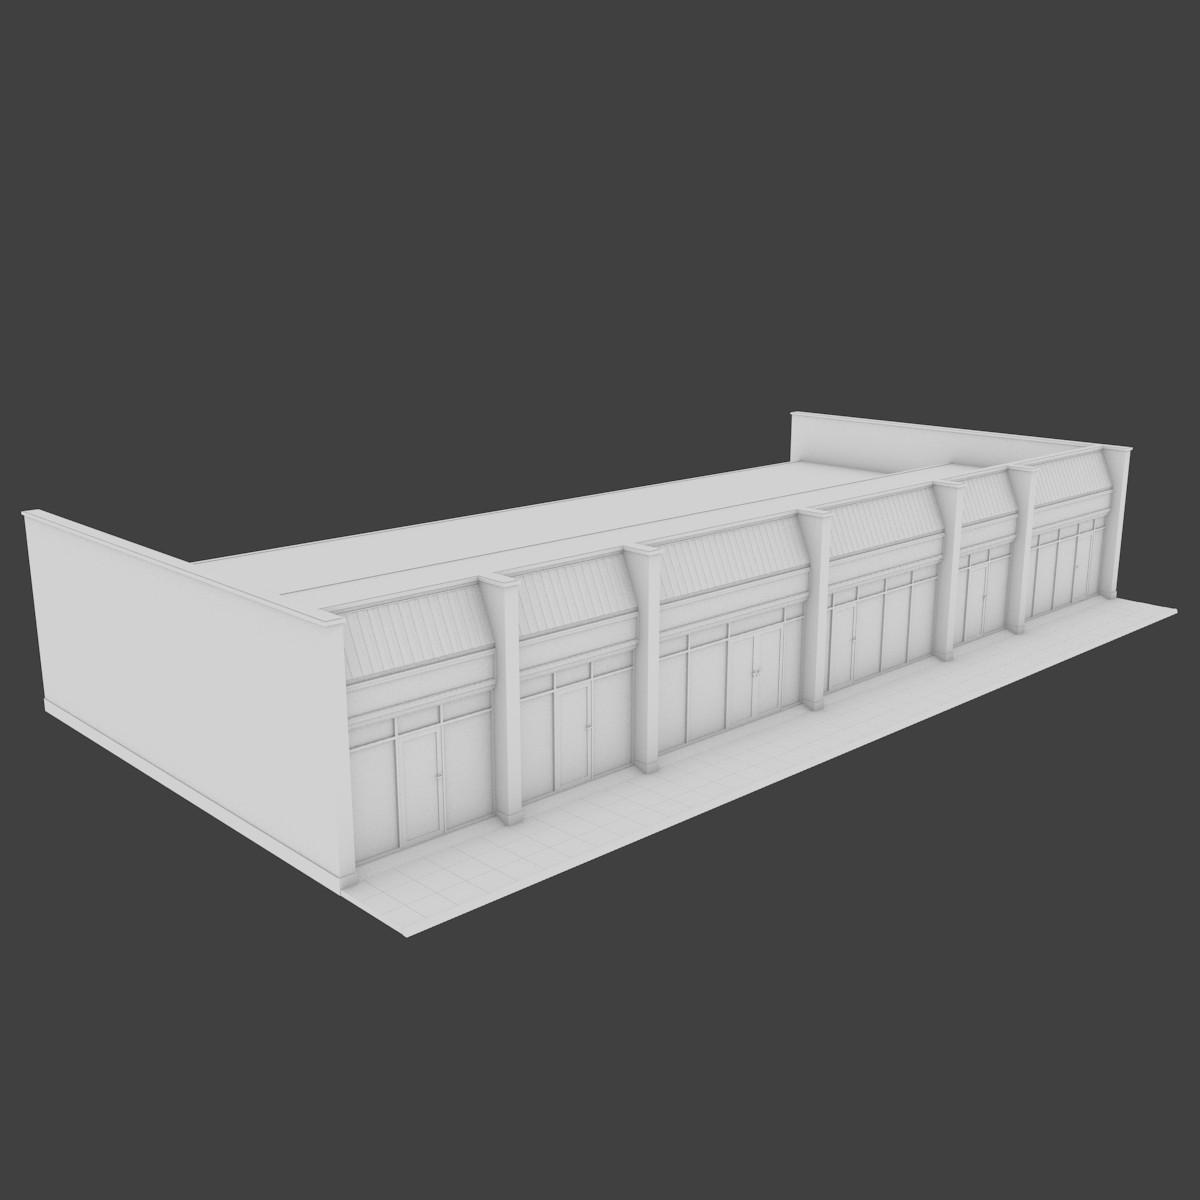 Design33Exterior_Preview01.png